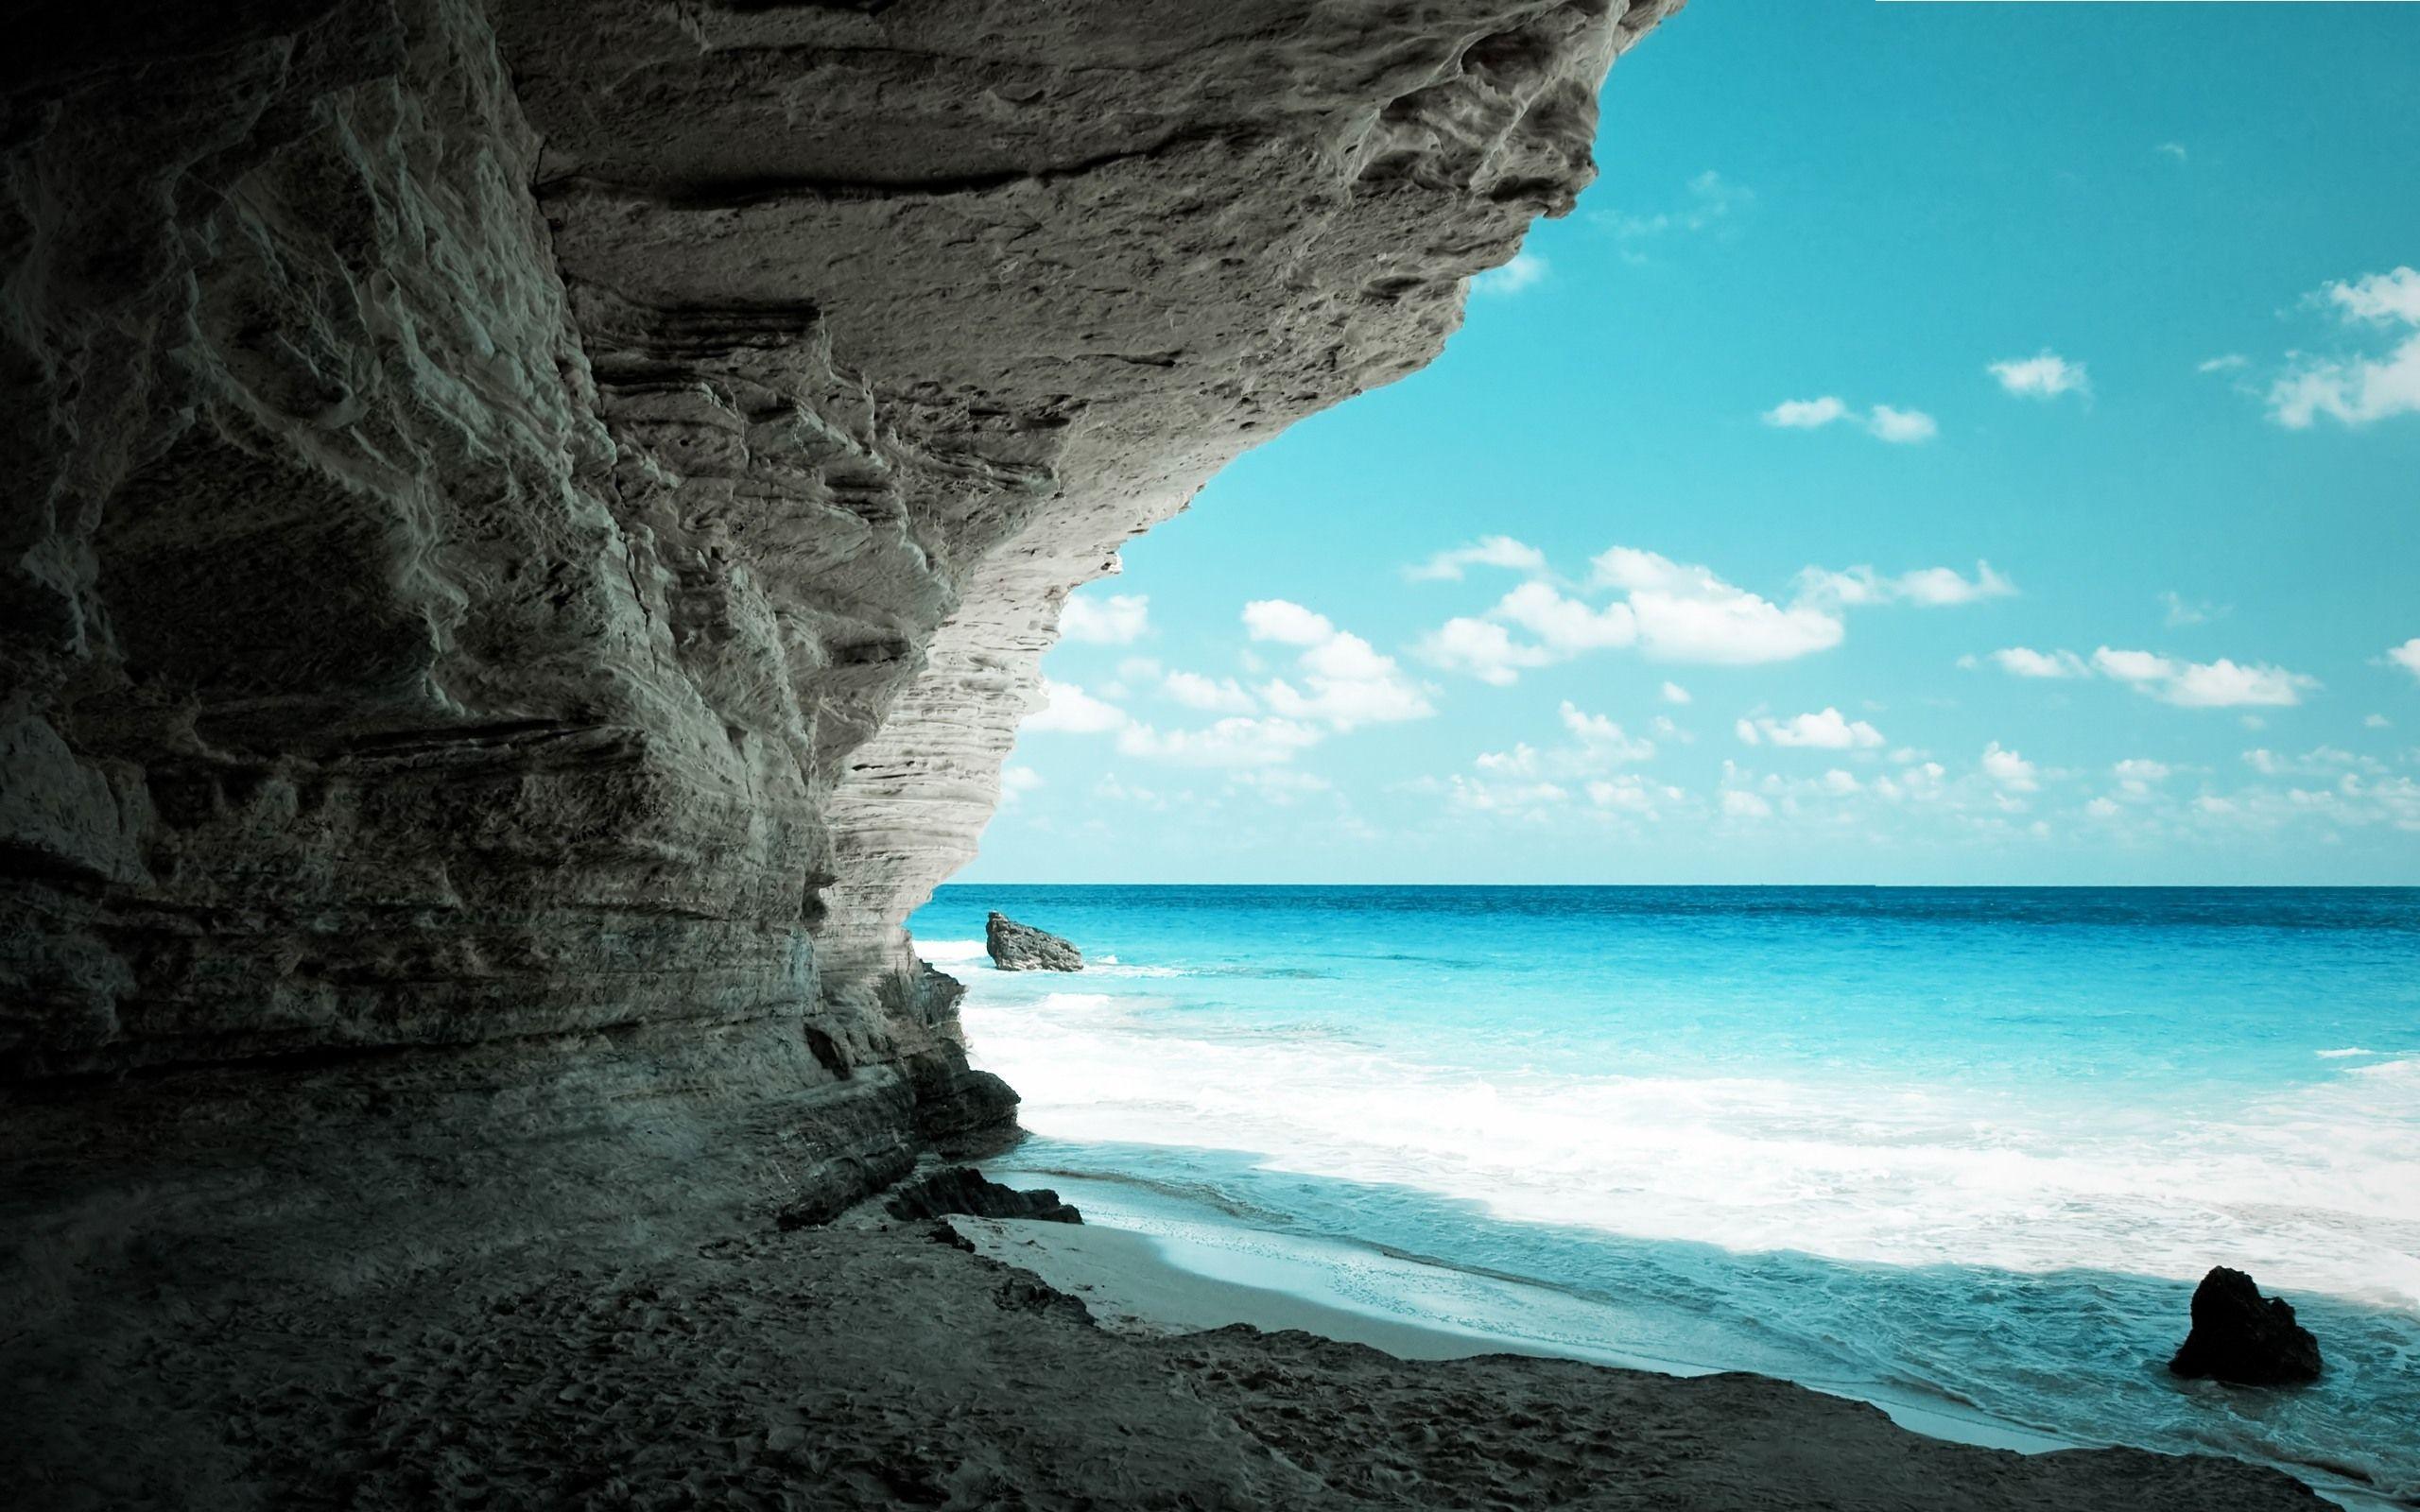 Jamaica Beach Wallpapers - Wallpaper Cave